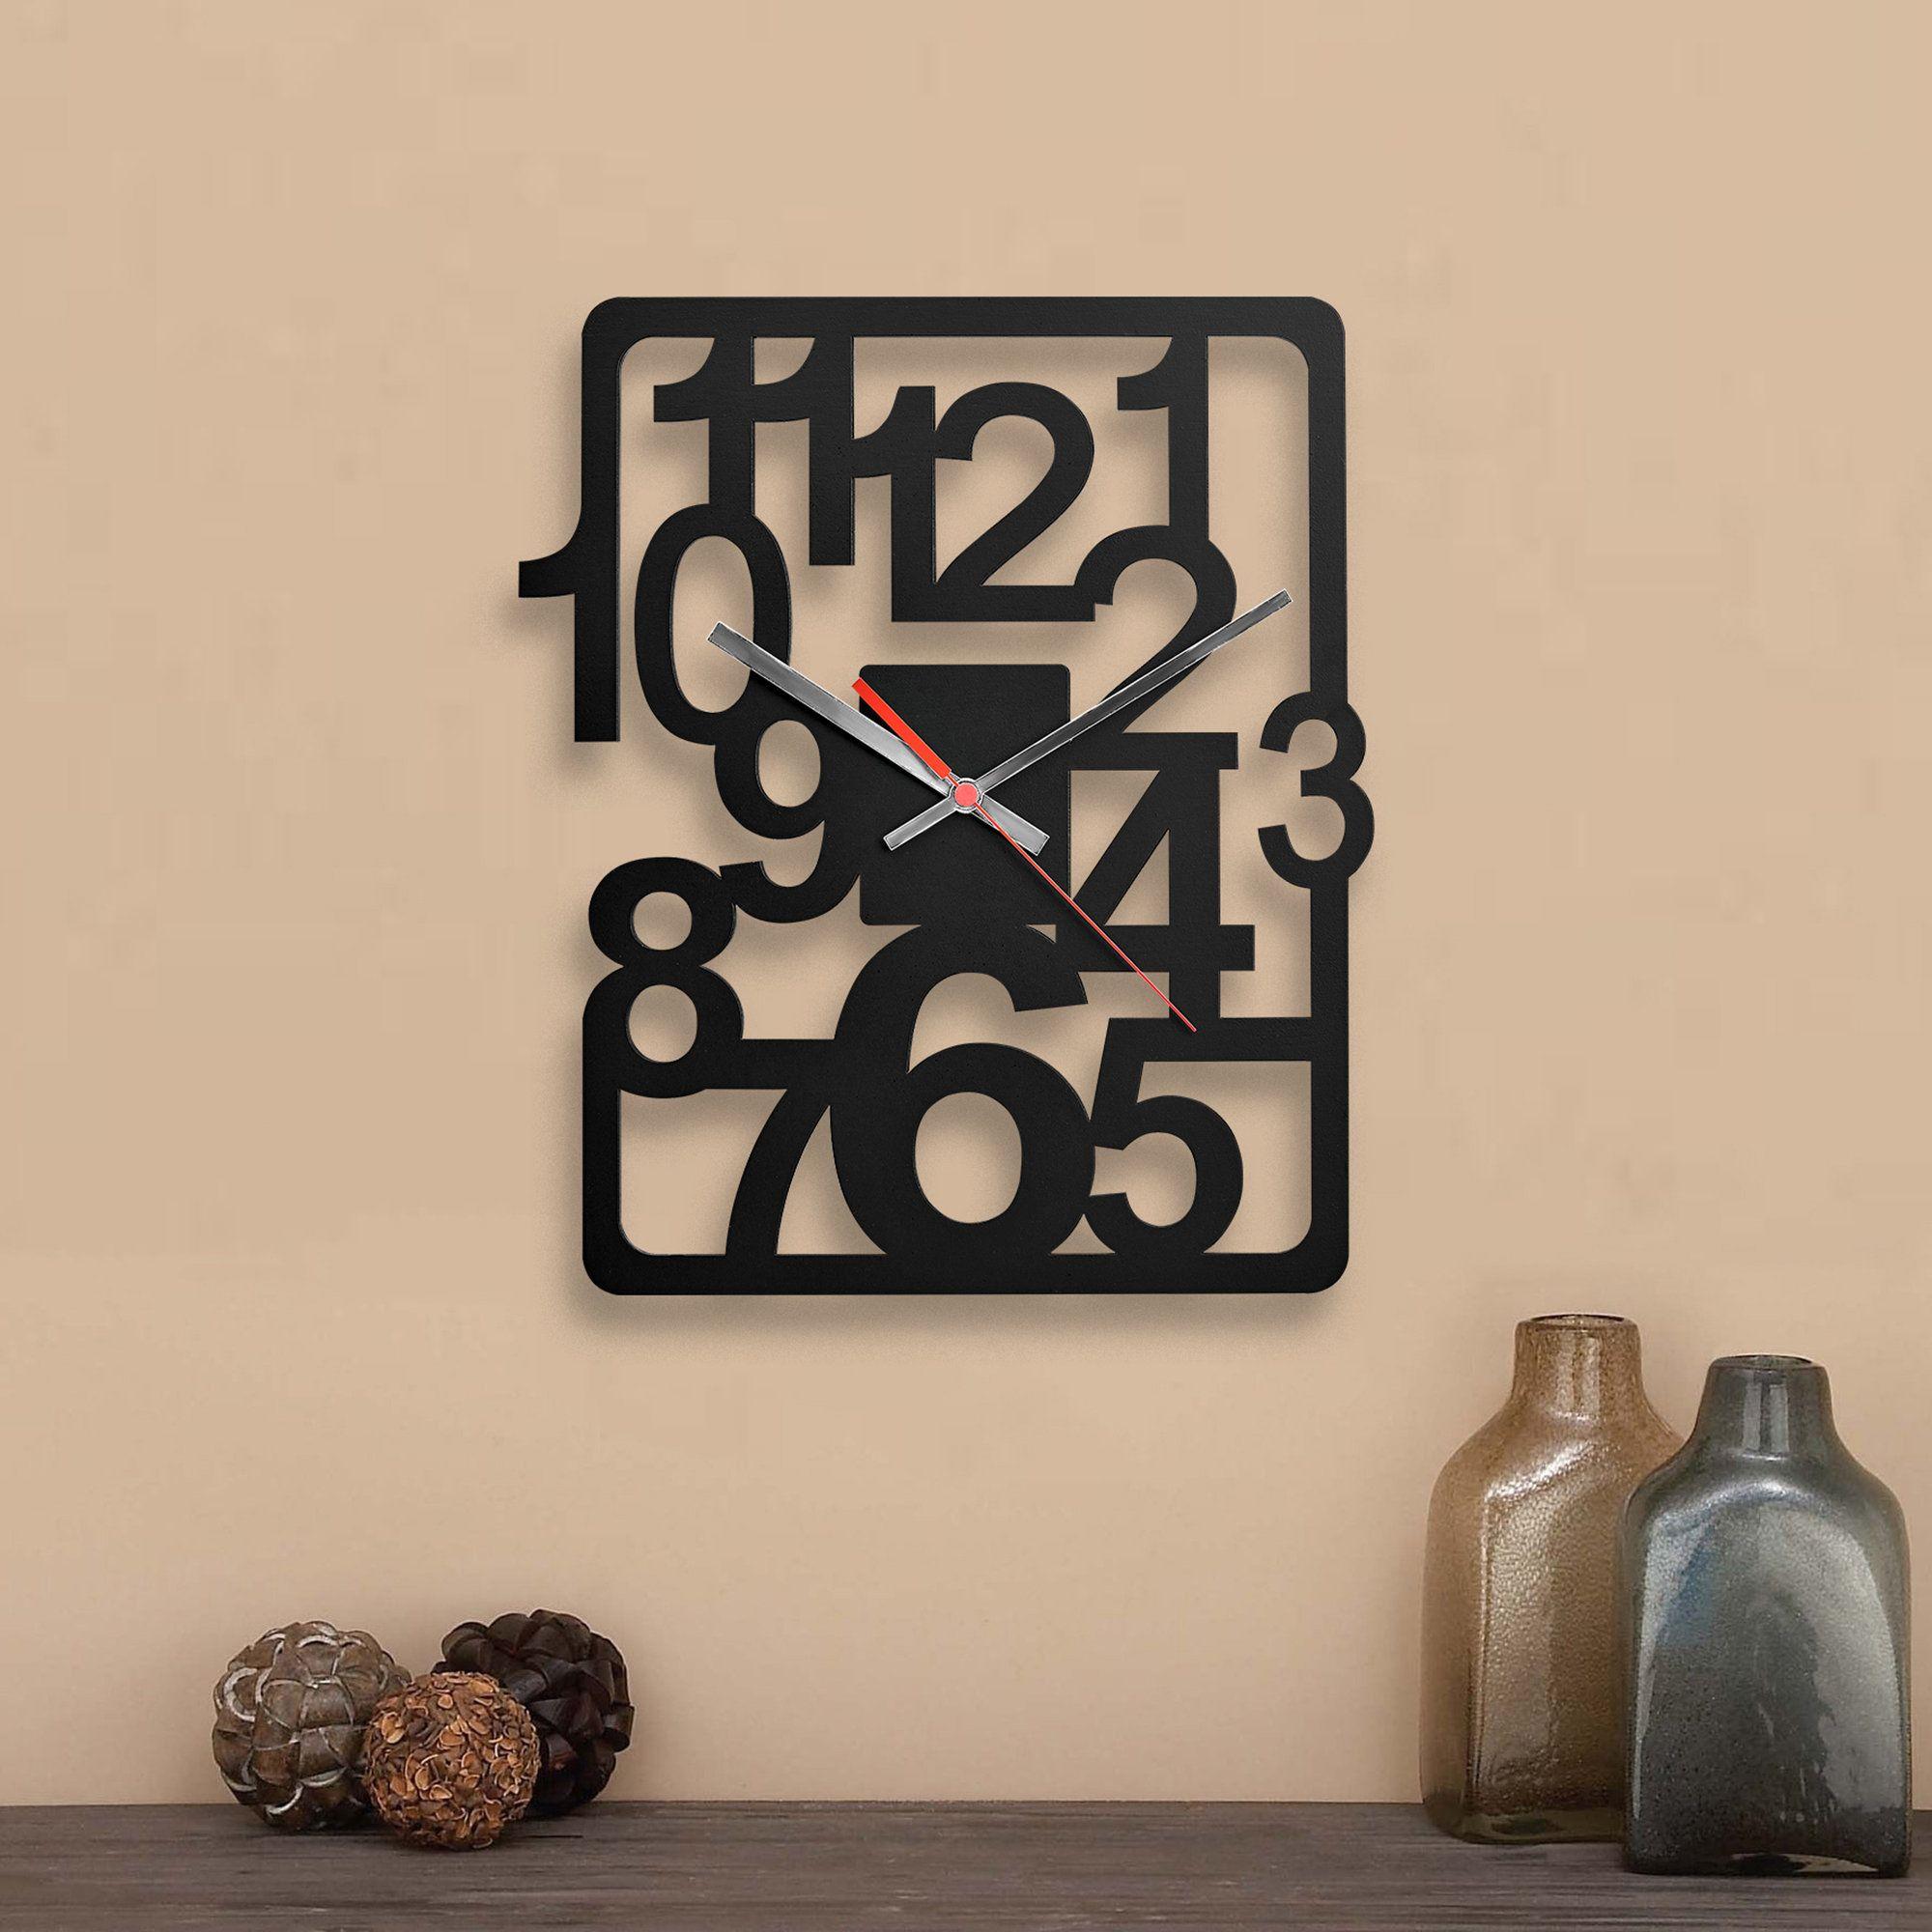 Modern Wall Clock Kitchen Wall Clock Decorative Large Wall Etsy In 2020 Clock Wall Decor Wall Clock Numbers Office Wall Clock